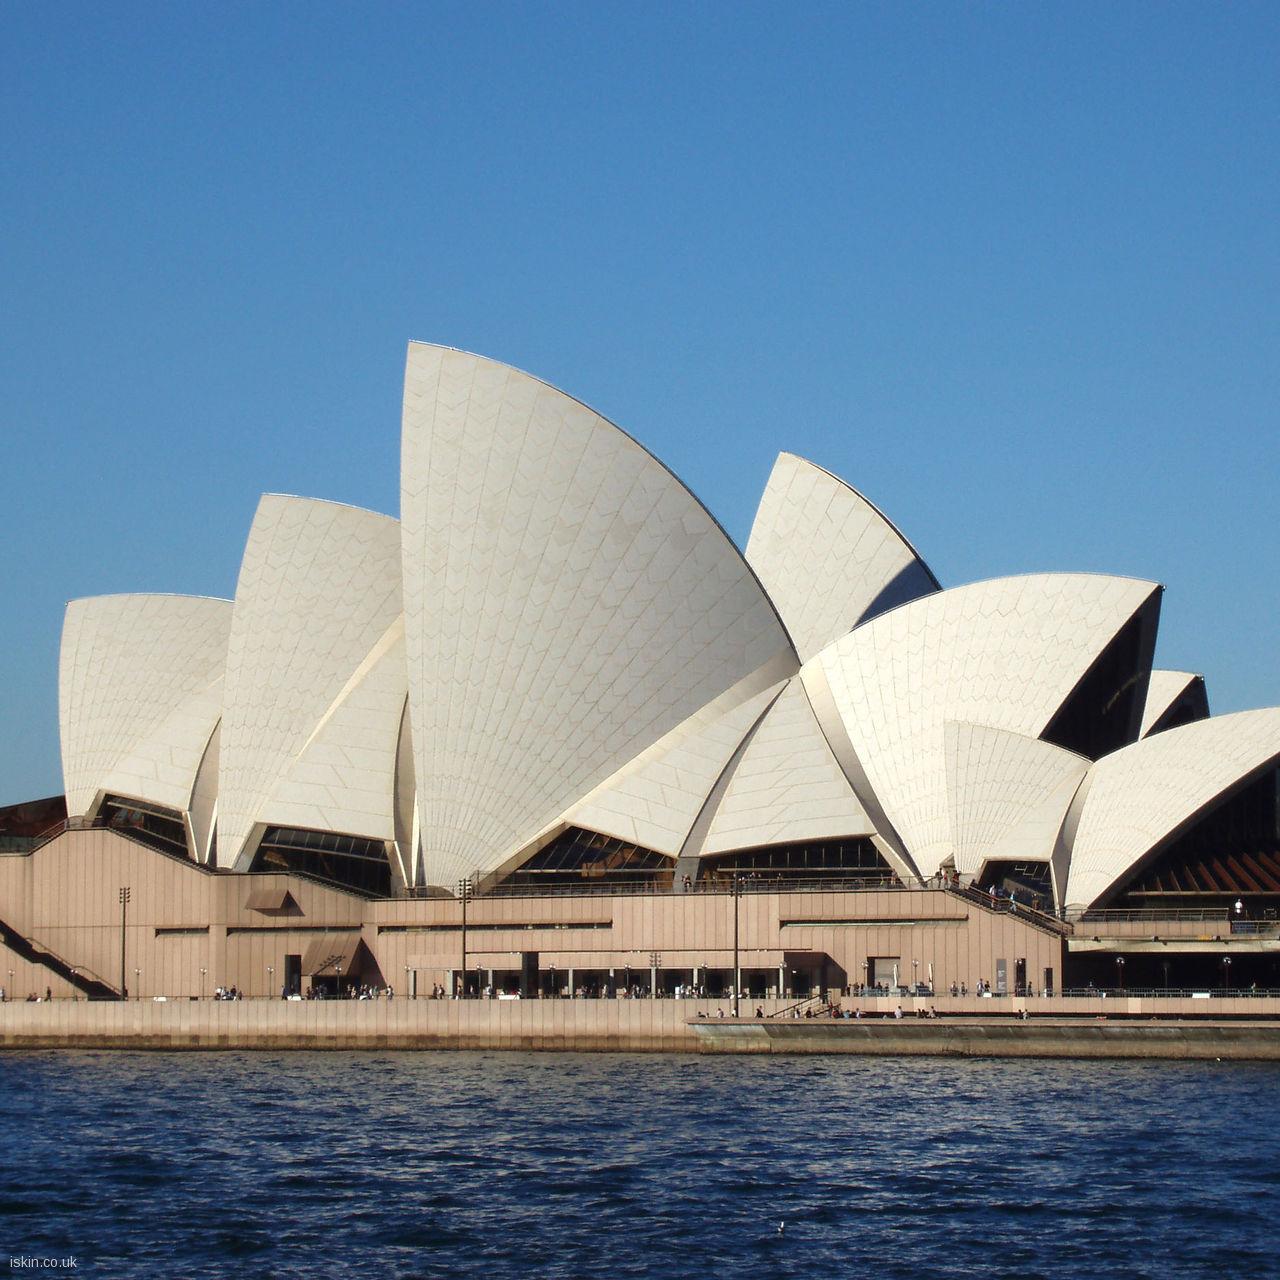 Sydney Opera House Desktop Wallpaper iskincouk 1280x1280